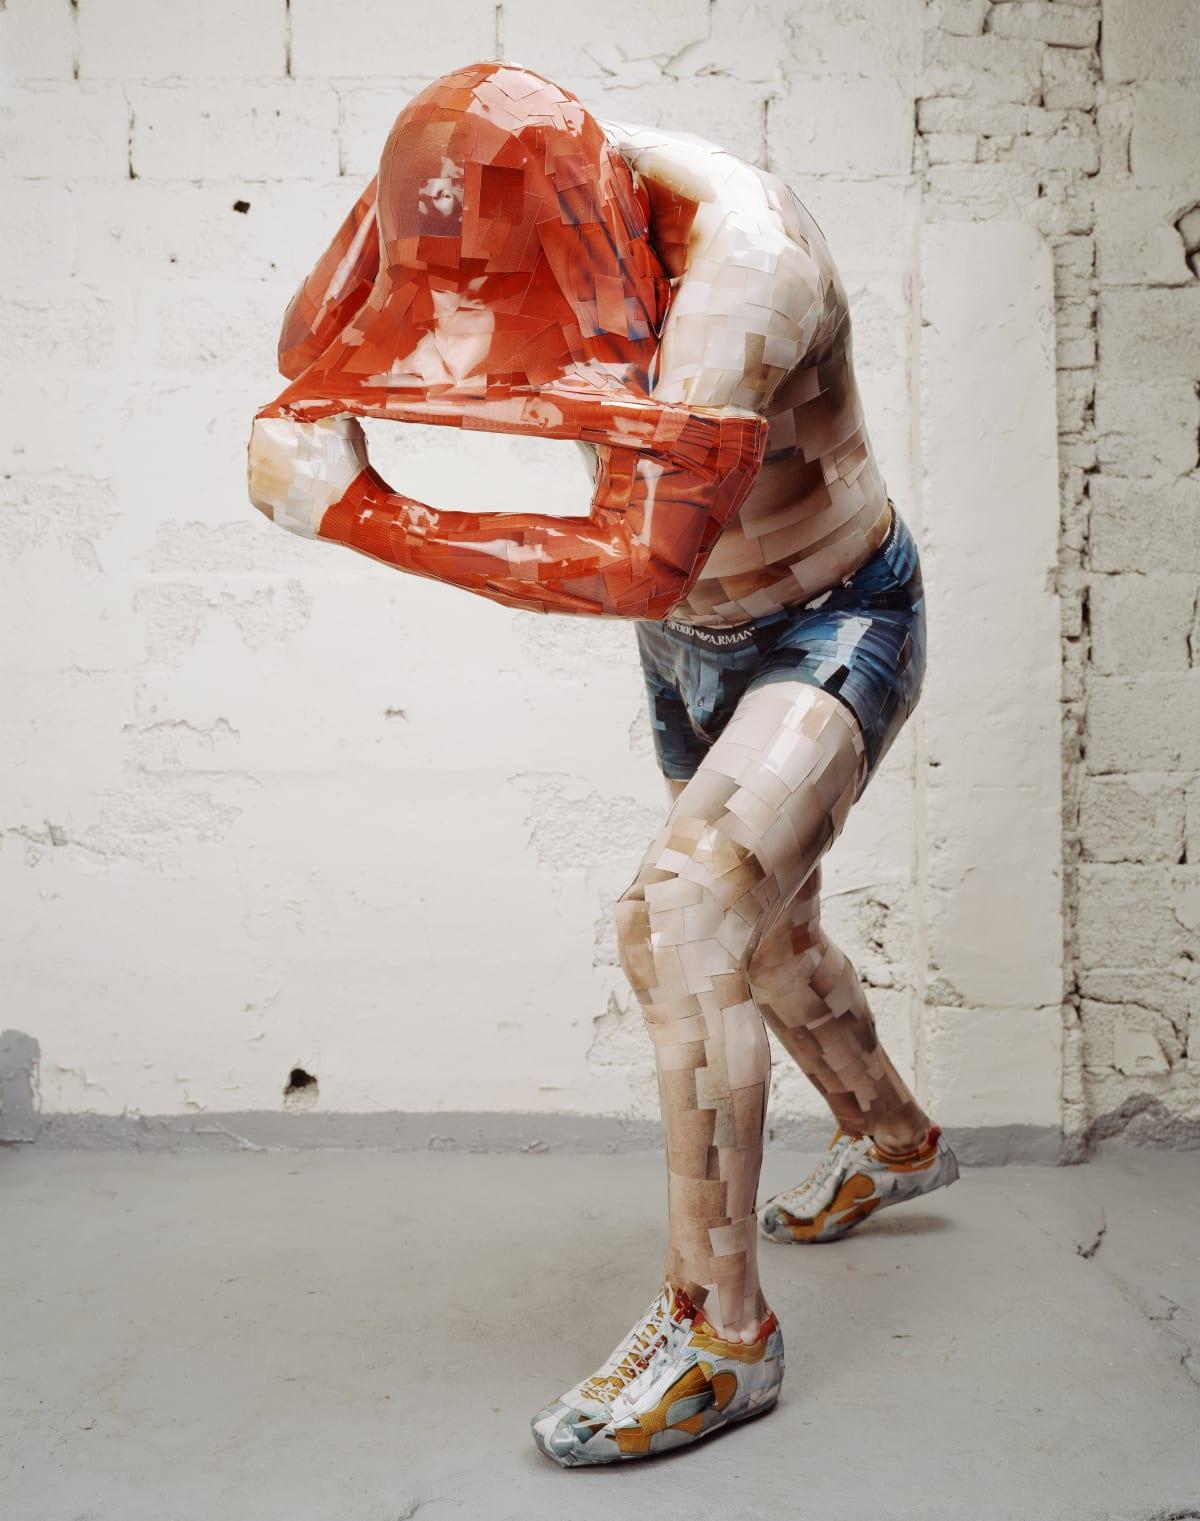 Red Sun, 2005-2006, C-print, mixed media, 158 x 73 x 155 cm